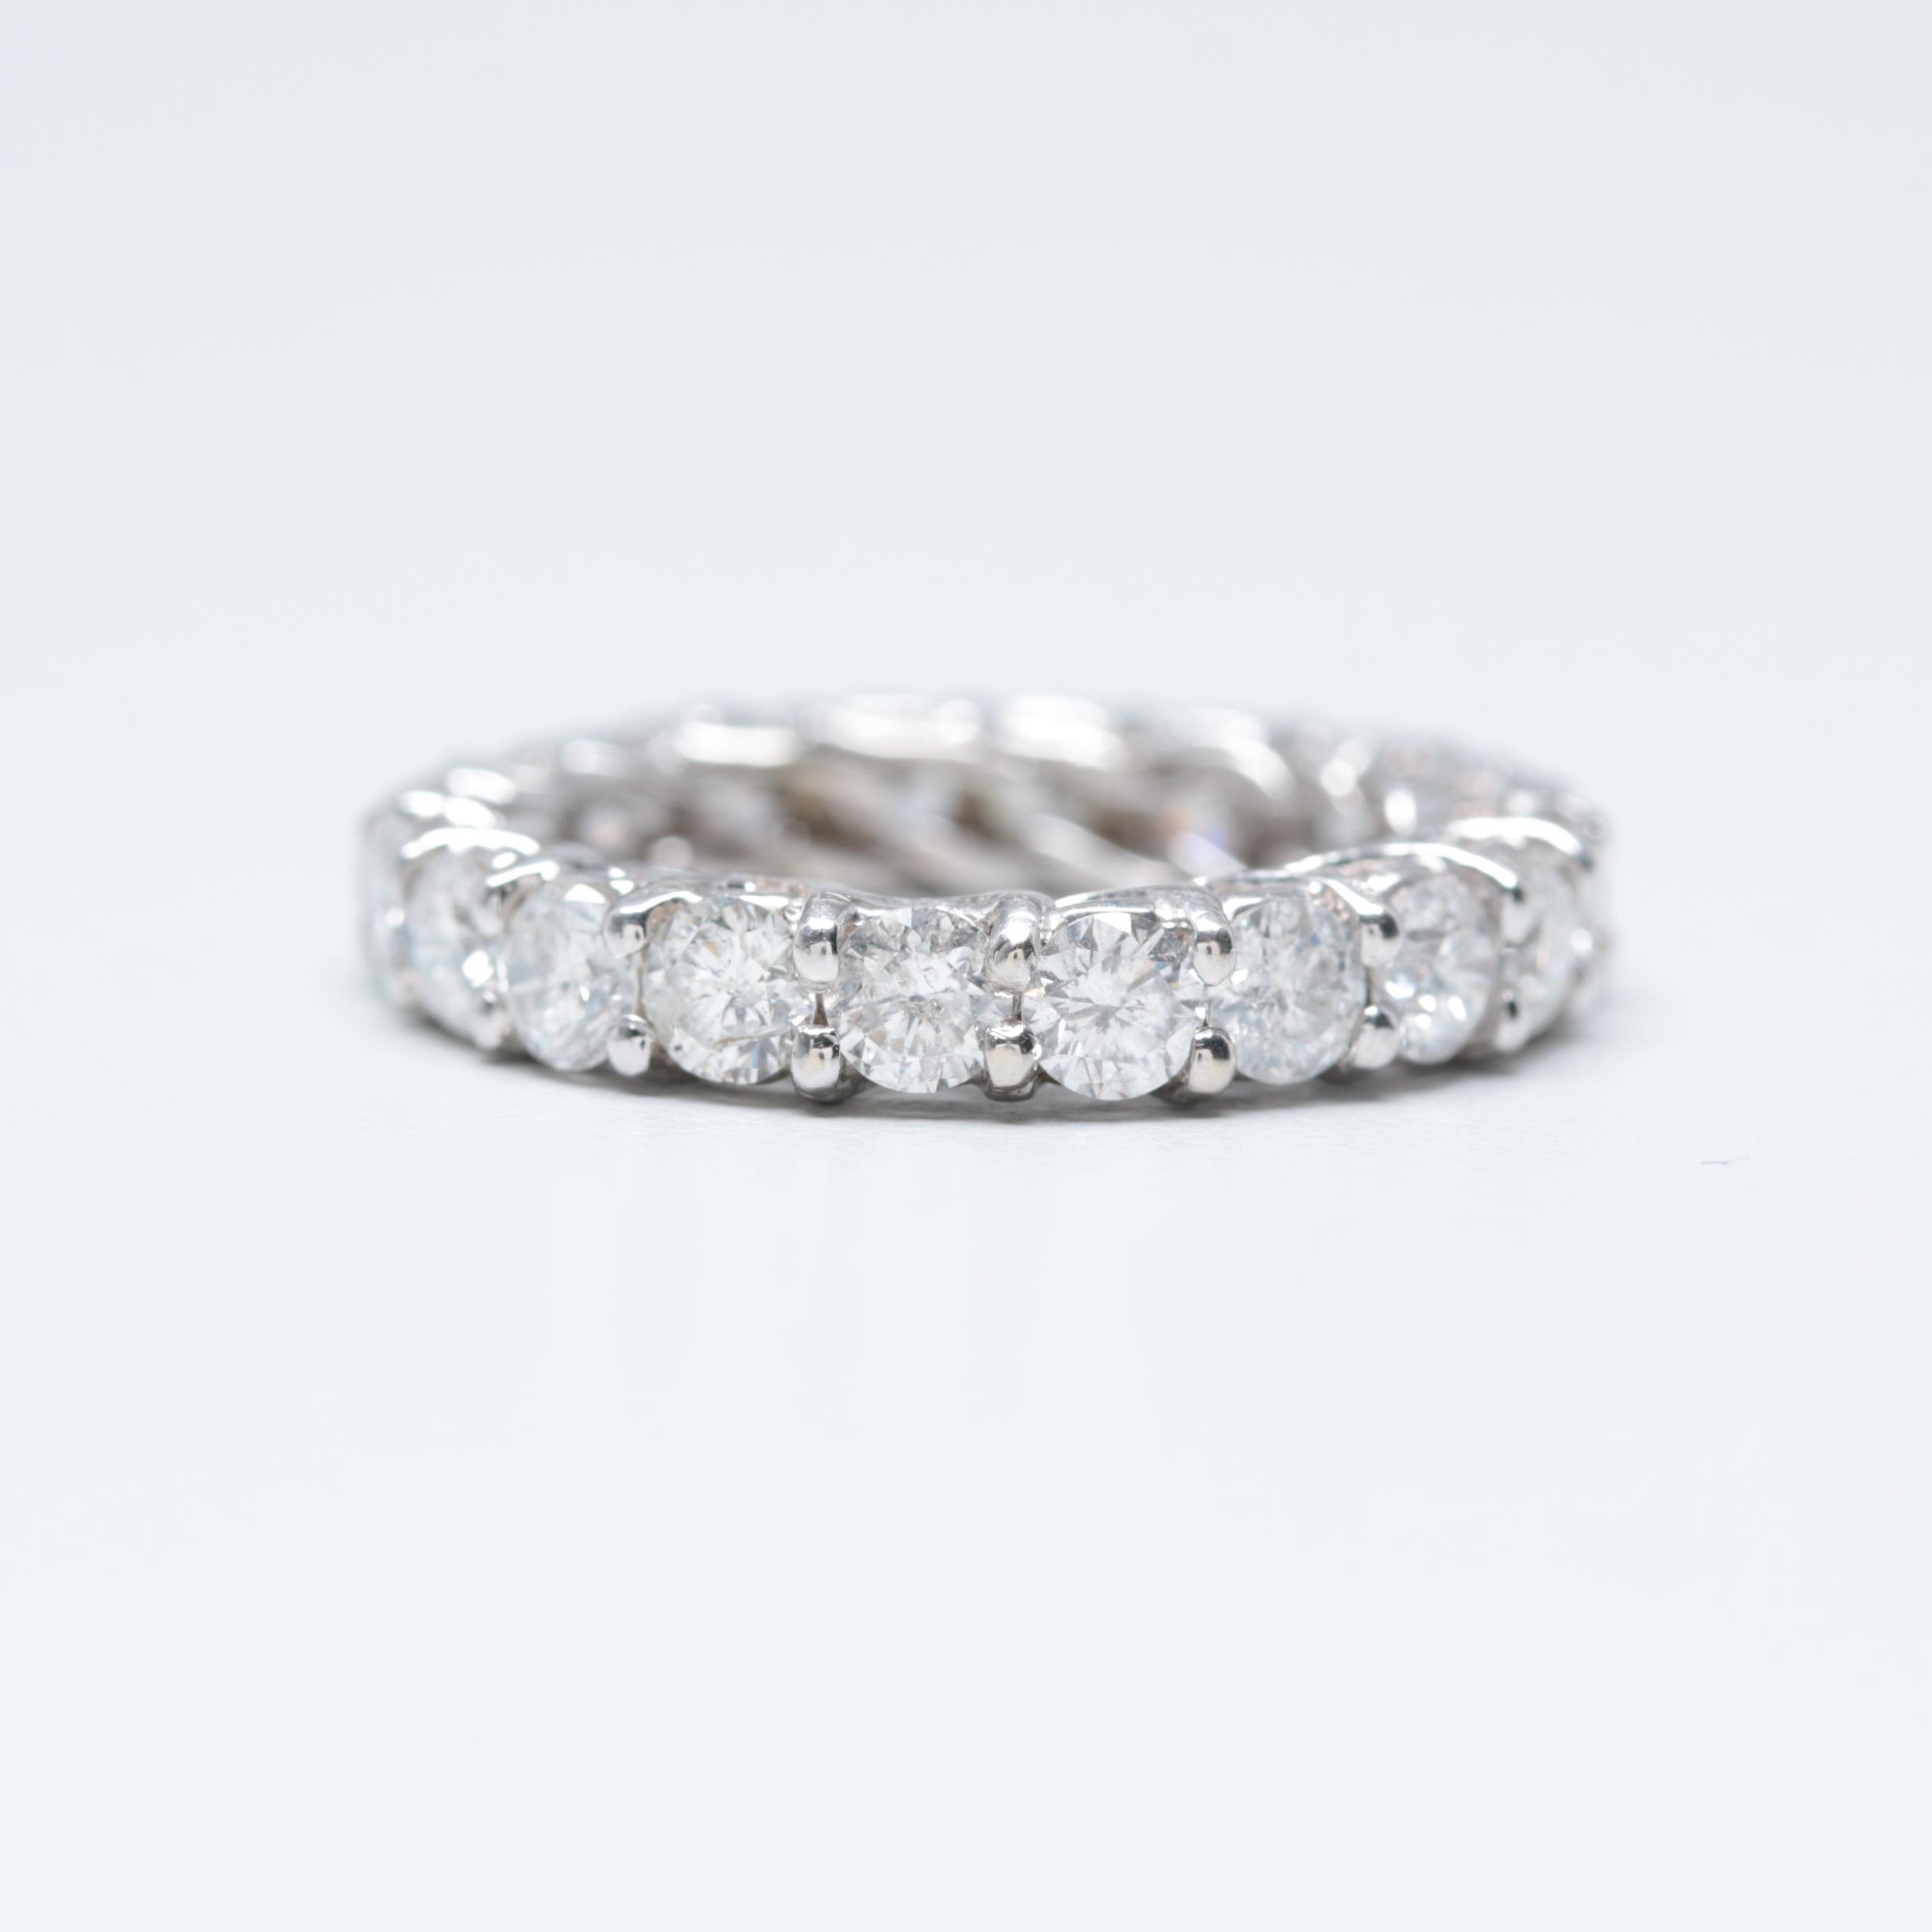 14K White Gold 2.94 CTW Diamond Eternity Ring